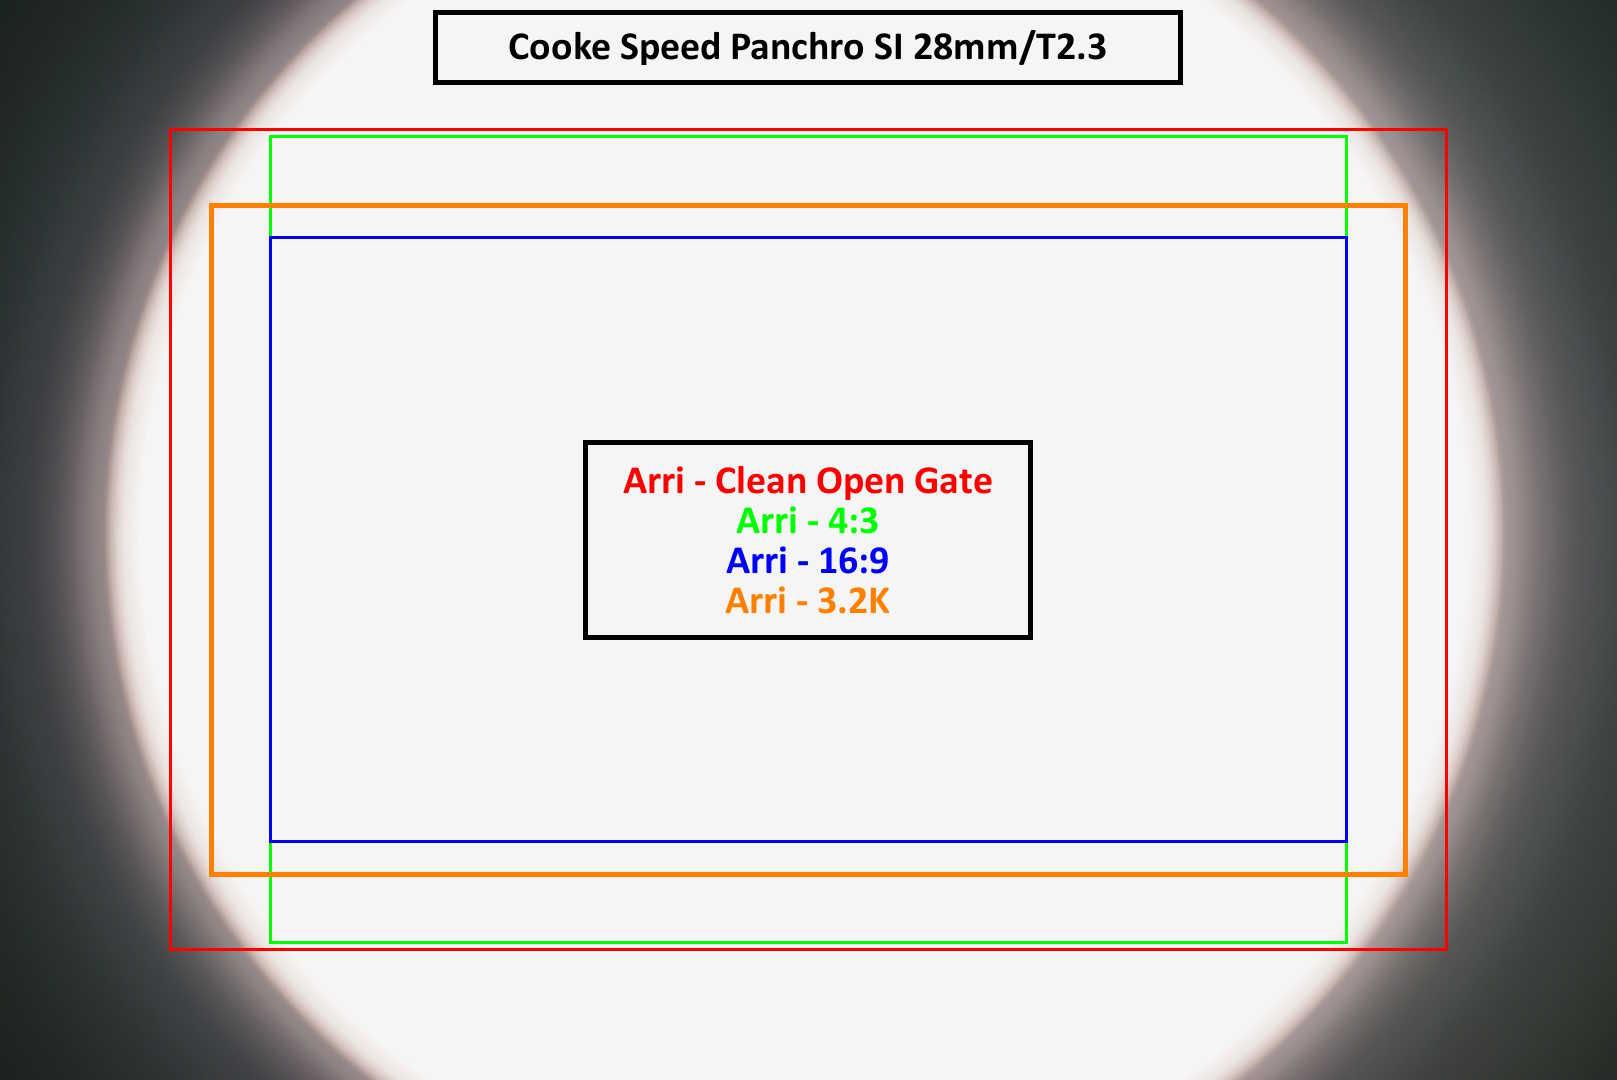 https://cdn02.plentymarkets.com/ap9ym7pvxhhf/frontend/ImageCircle/Cooke_SpeedPanchro_SI/28mm/FullAperture/ImageCircle_Cooke_SpeedPanchro_SI_28mm_FullAperture_Arri.JPG